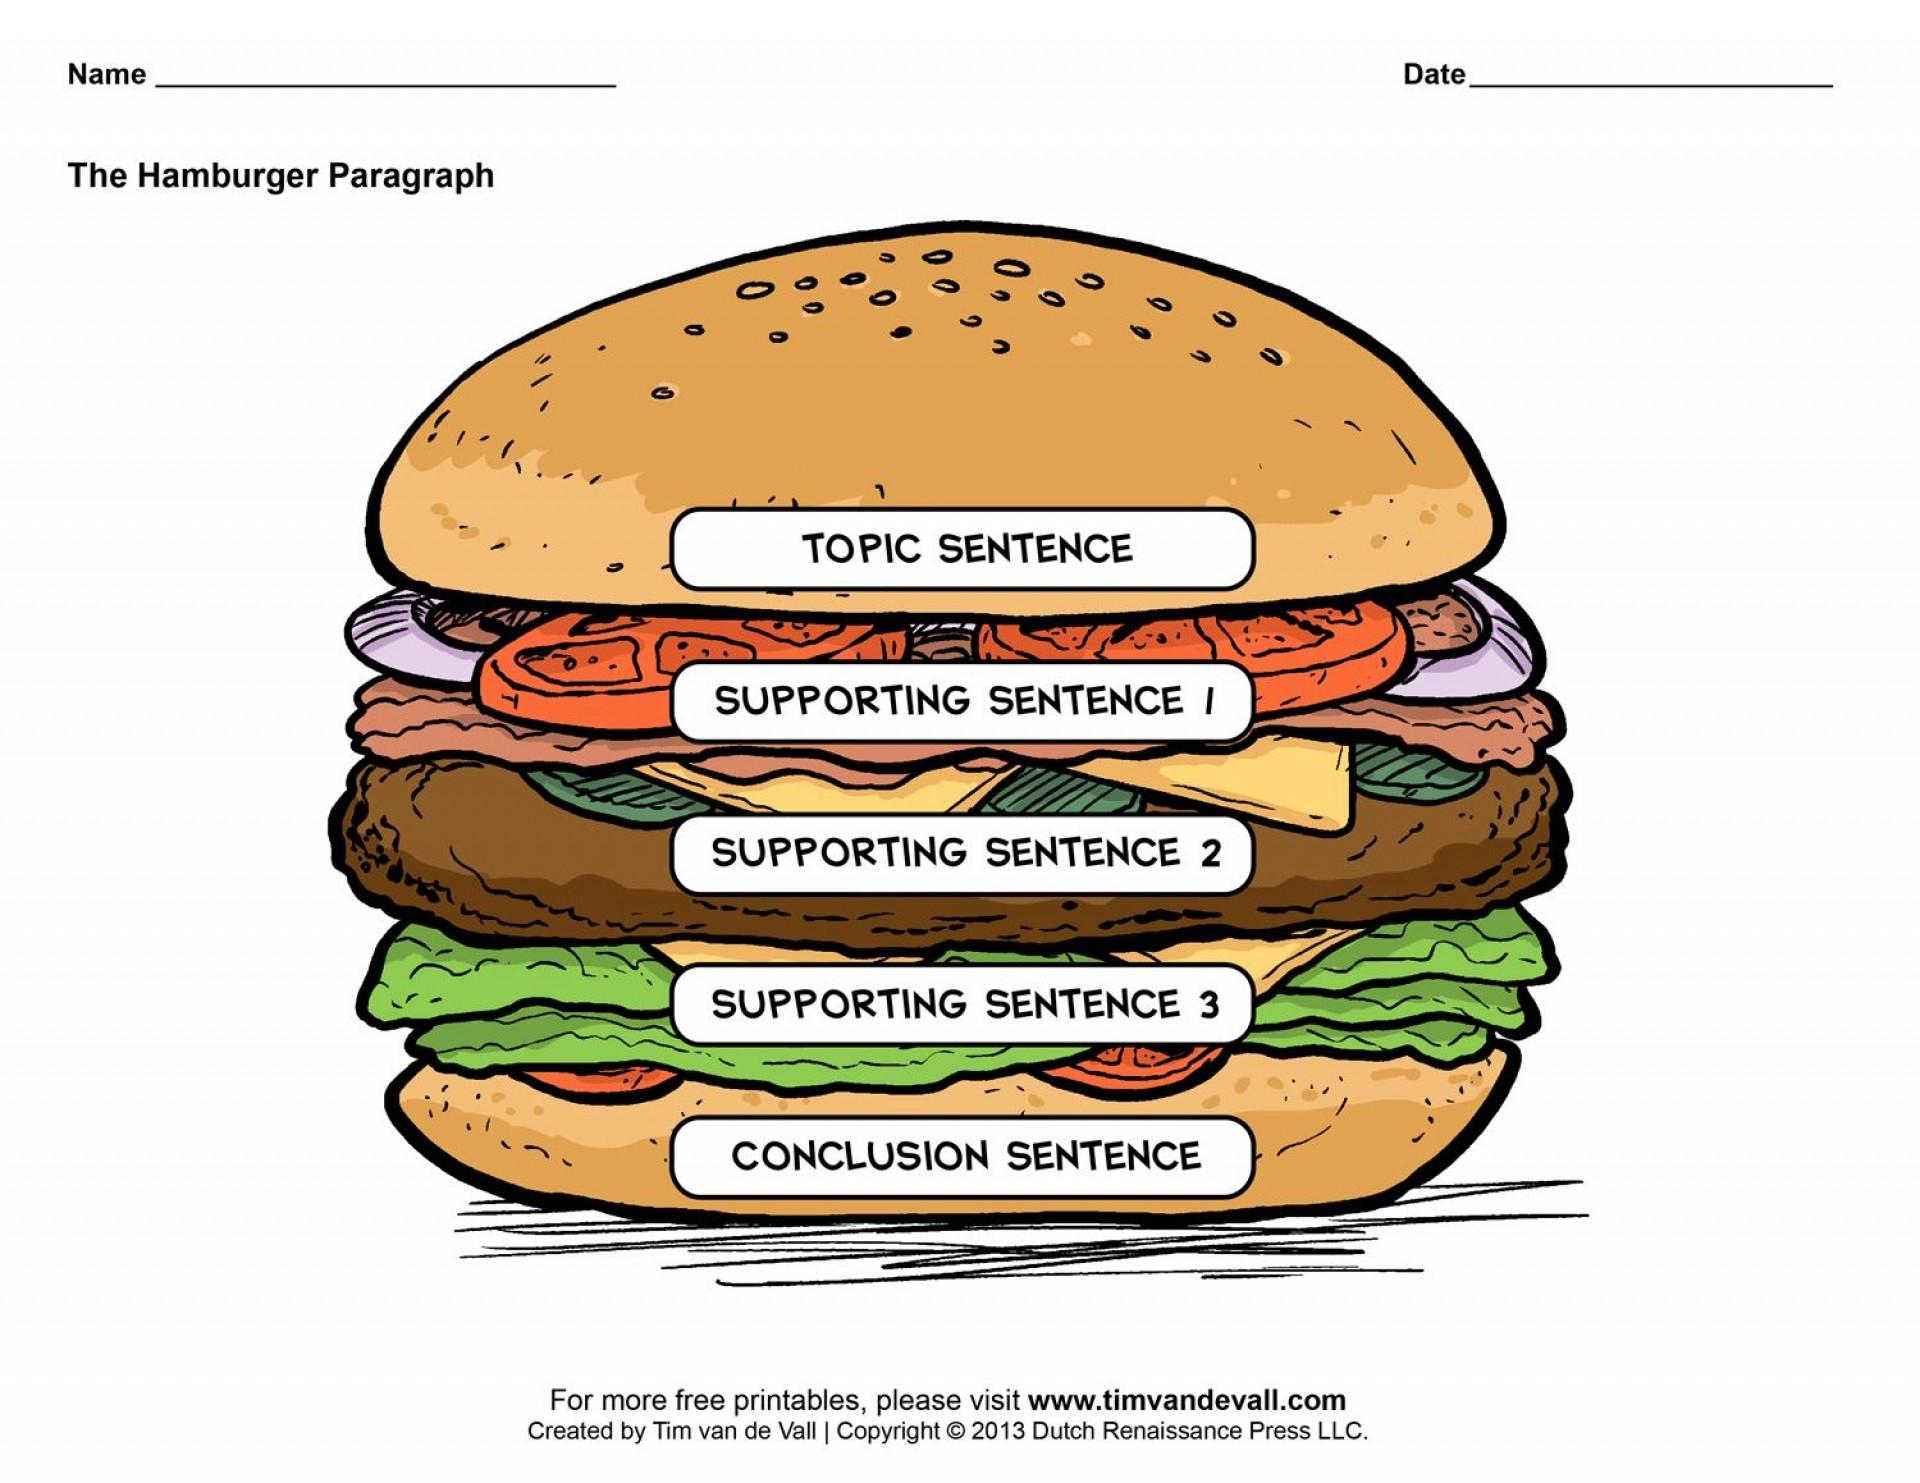 003 Hamburger Essay Thatsnotus